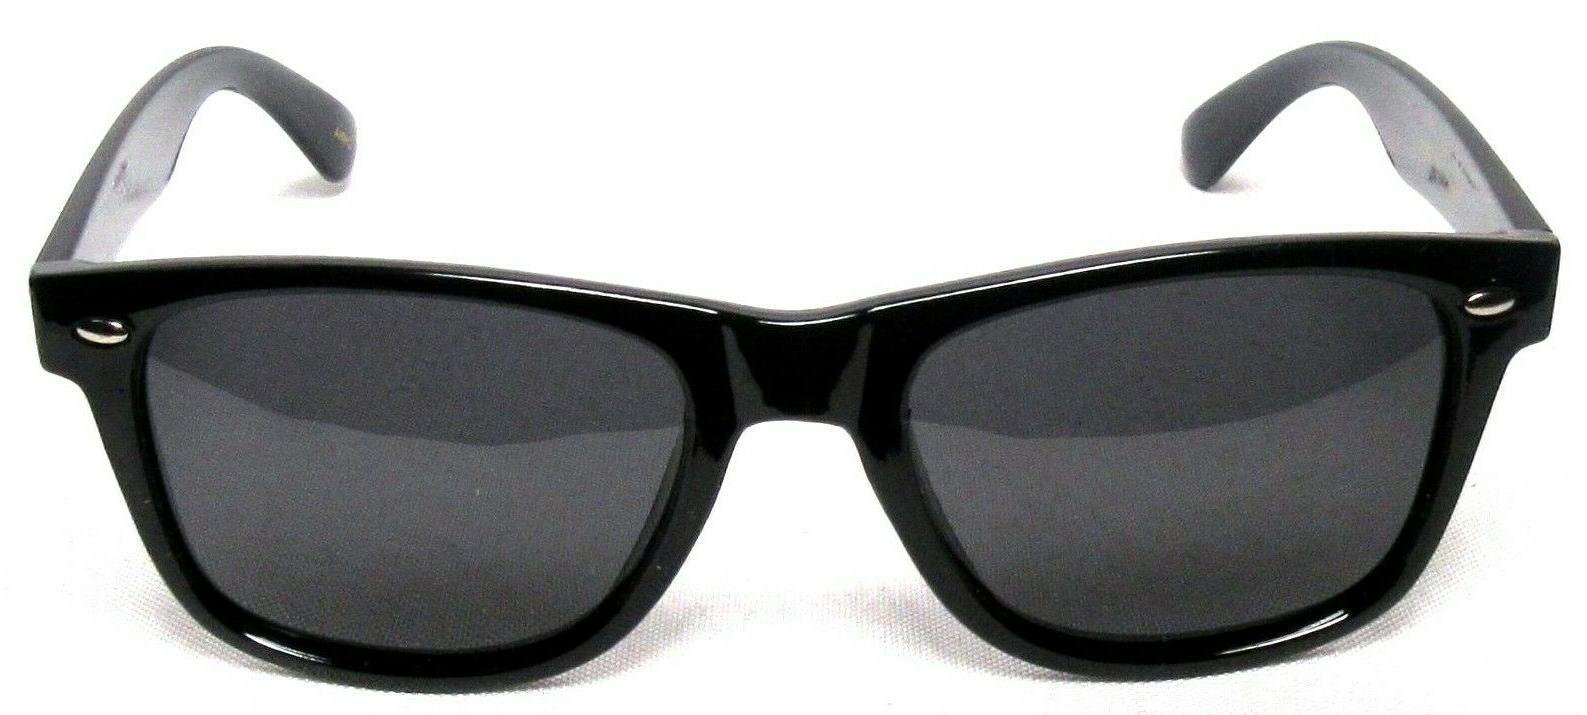 polarized 80 s retro sunglasses black uv